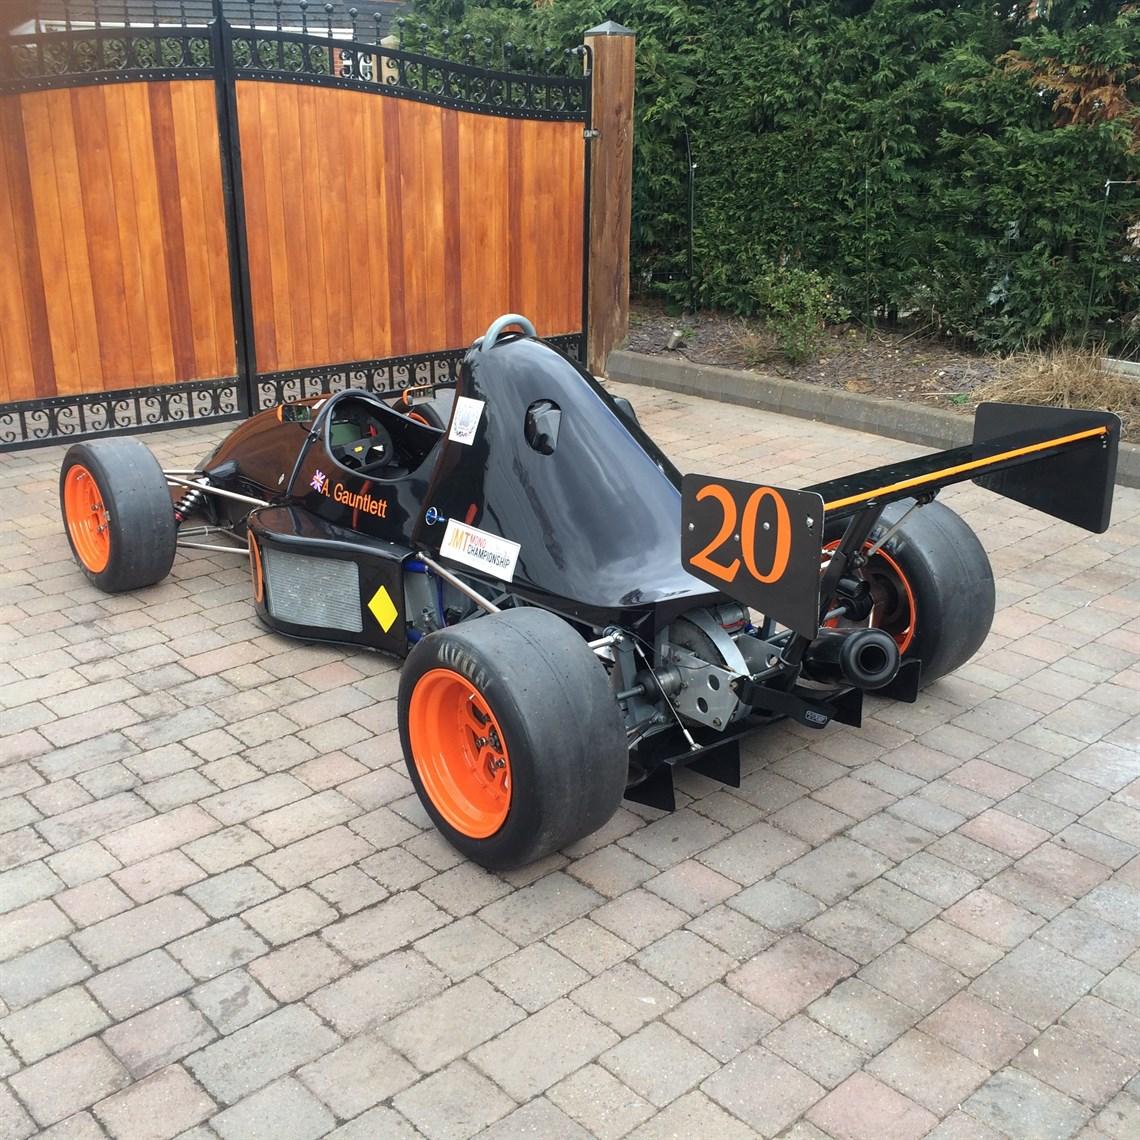 Formula Jedi With Brand New Tuned R1